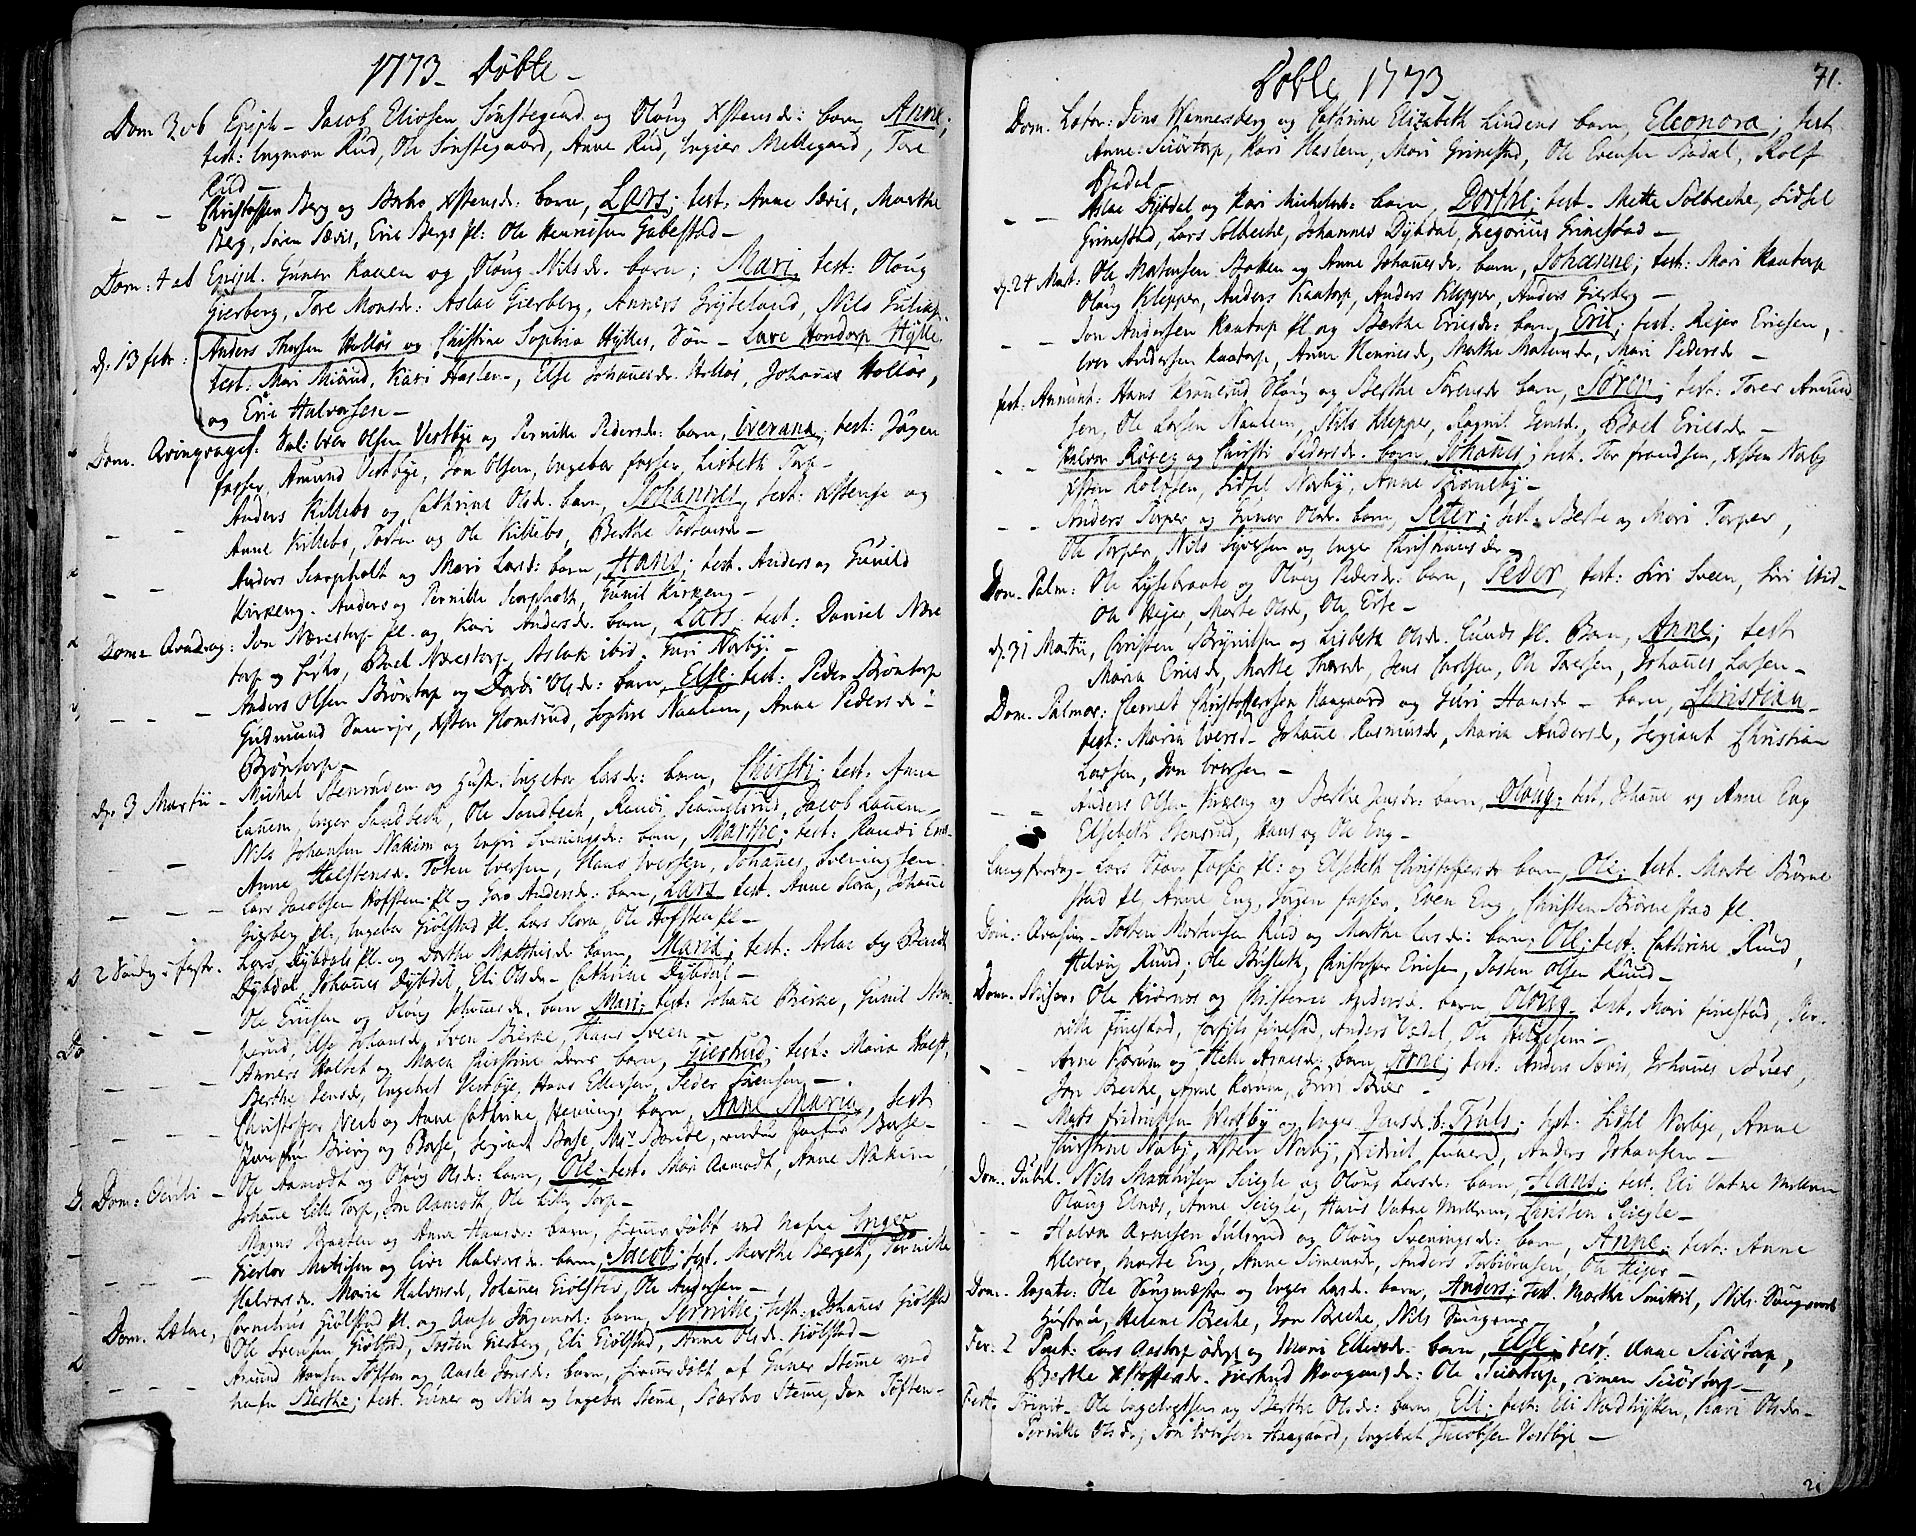 SAO, Rakkestad prestekontor Kirkebøker, F/Fa/L0003: Ministerialbok nr. I 3, 1752-1777, s. 71